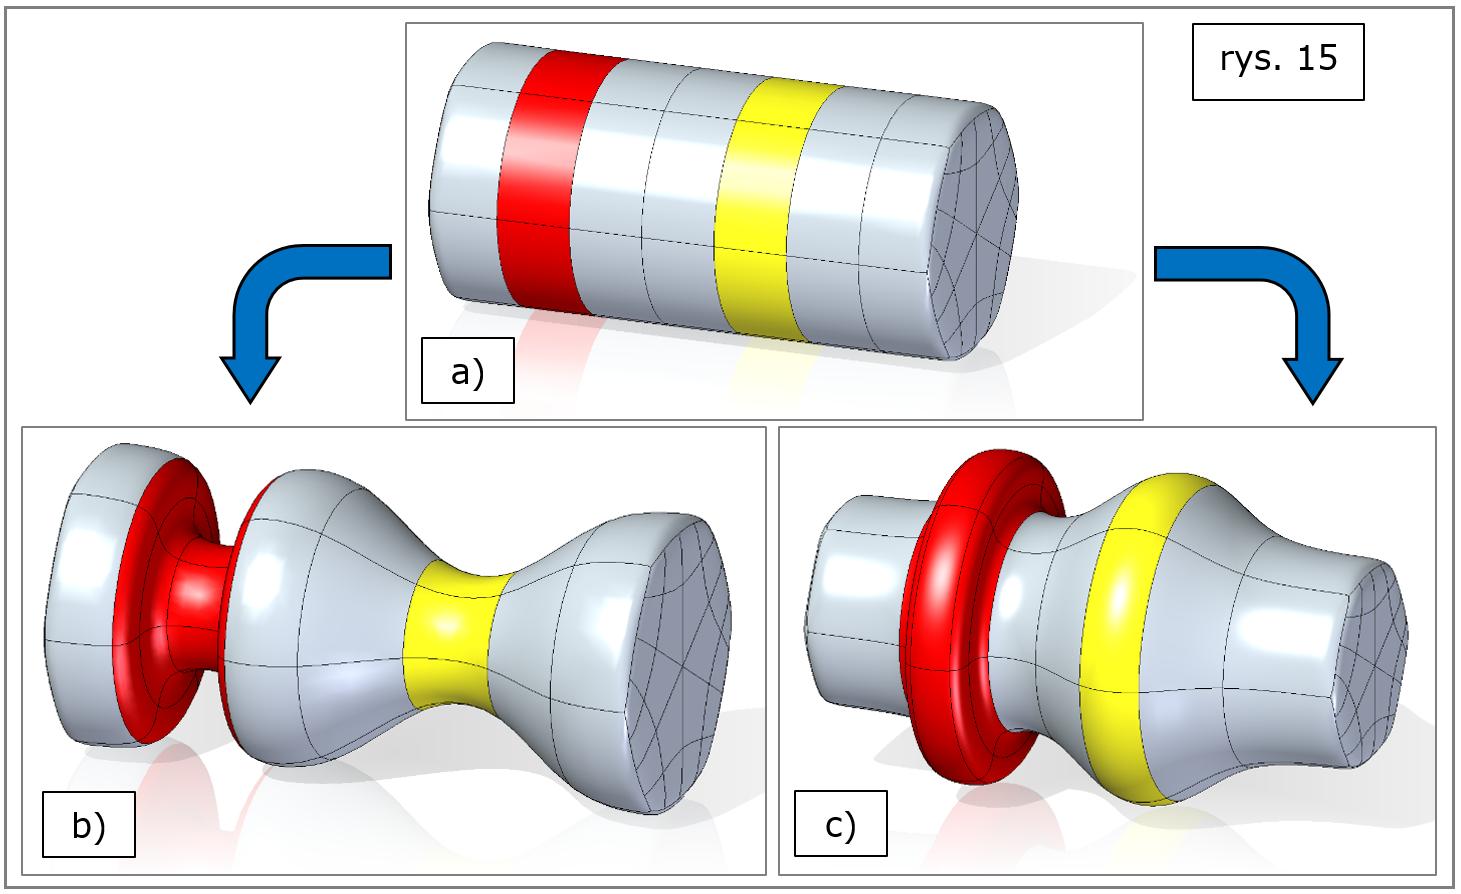 subdivision-modeling-odsuniecia-Solid Edge-2022